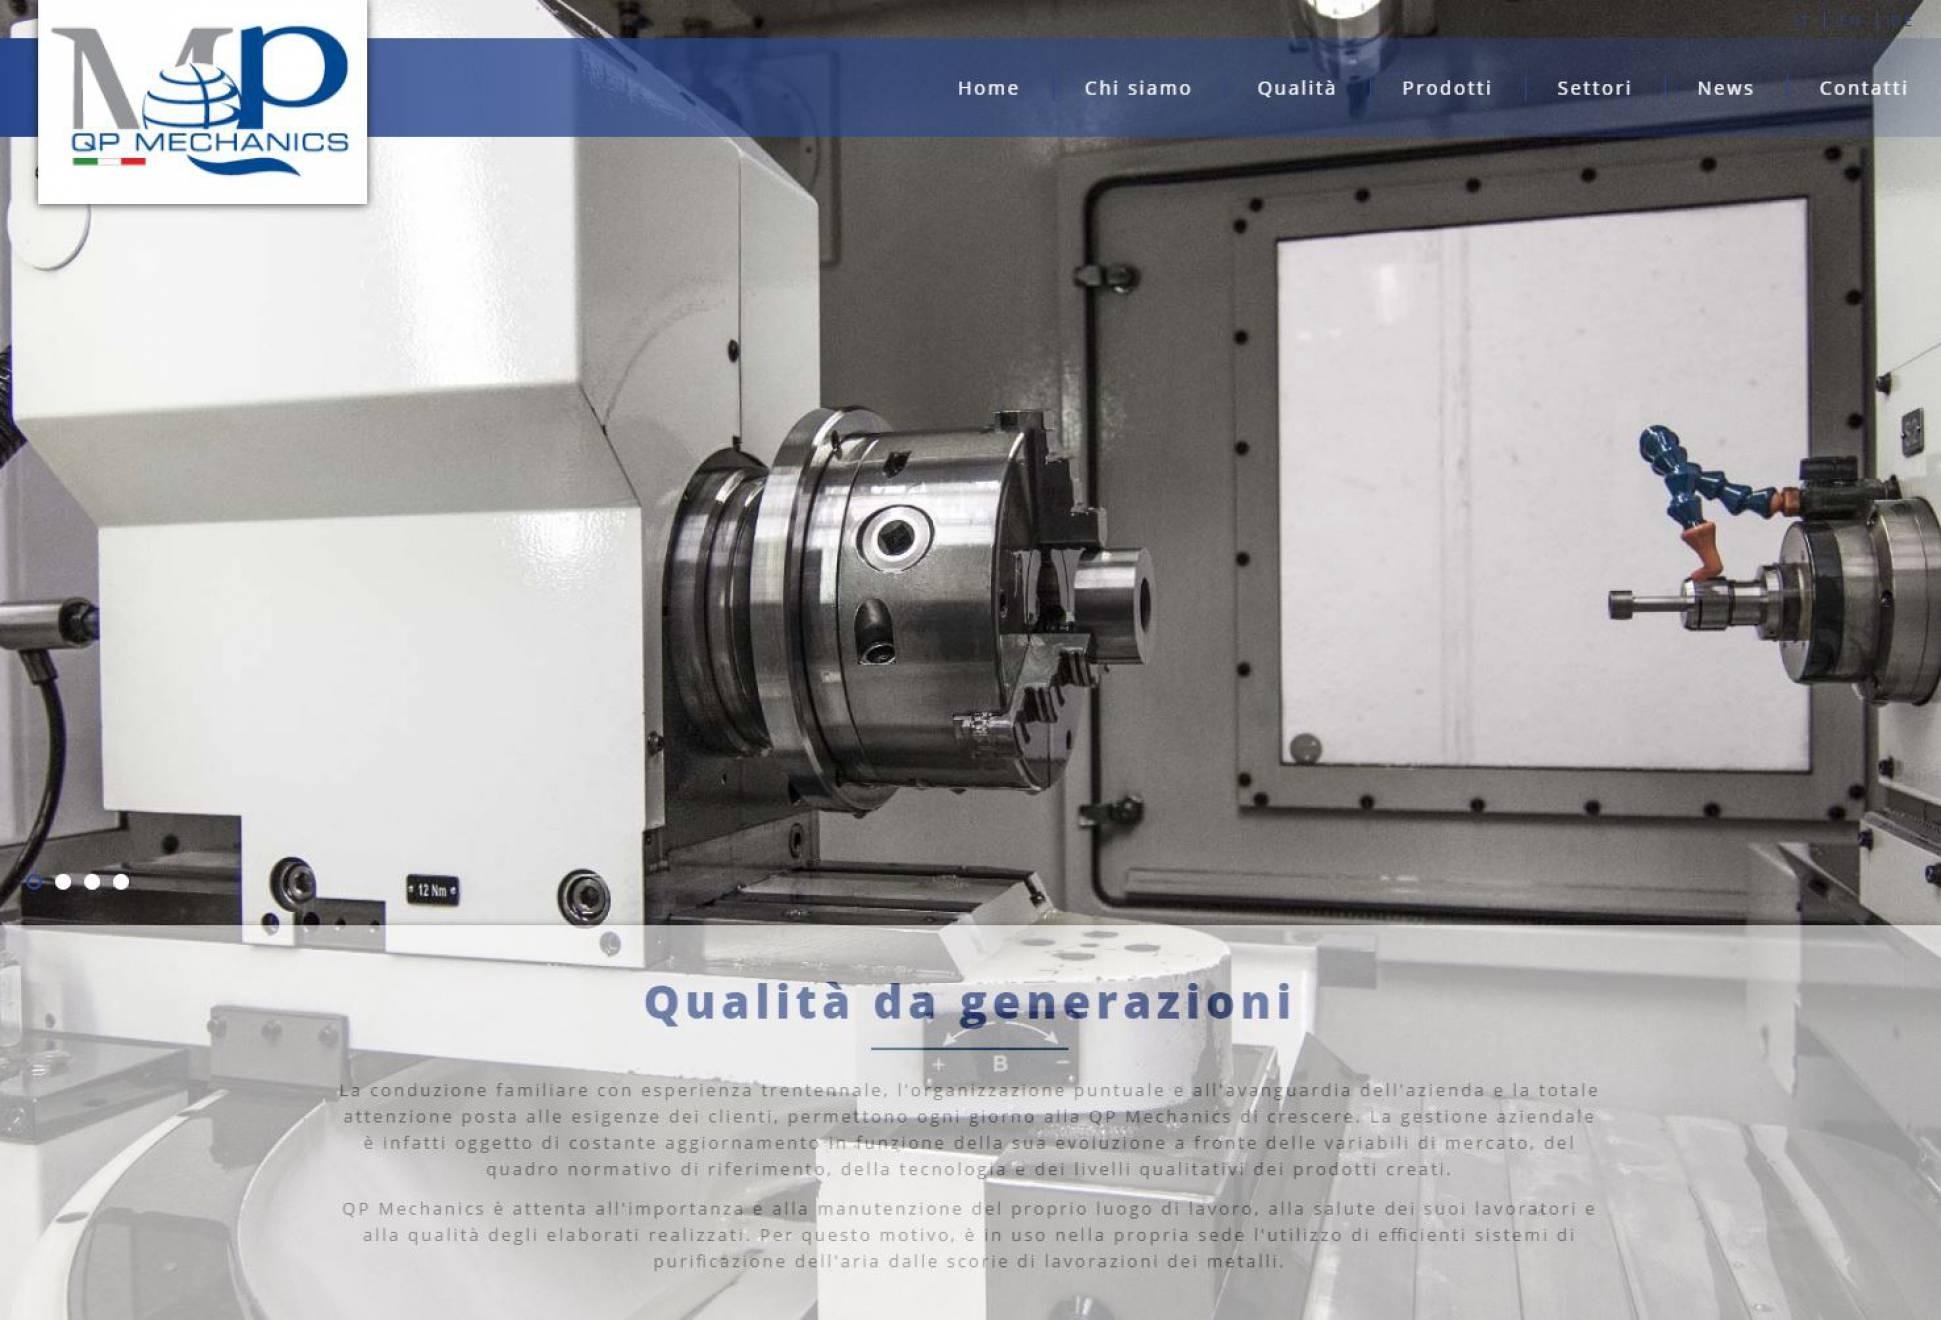 Qualità sito internet responsive ottimizzato QP Mechanics NewVisibility